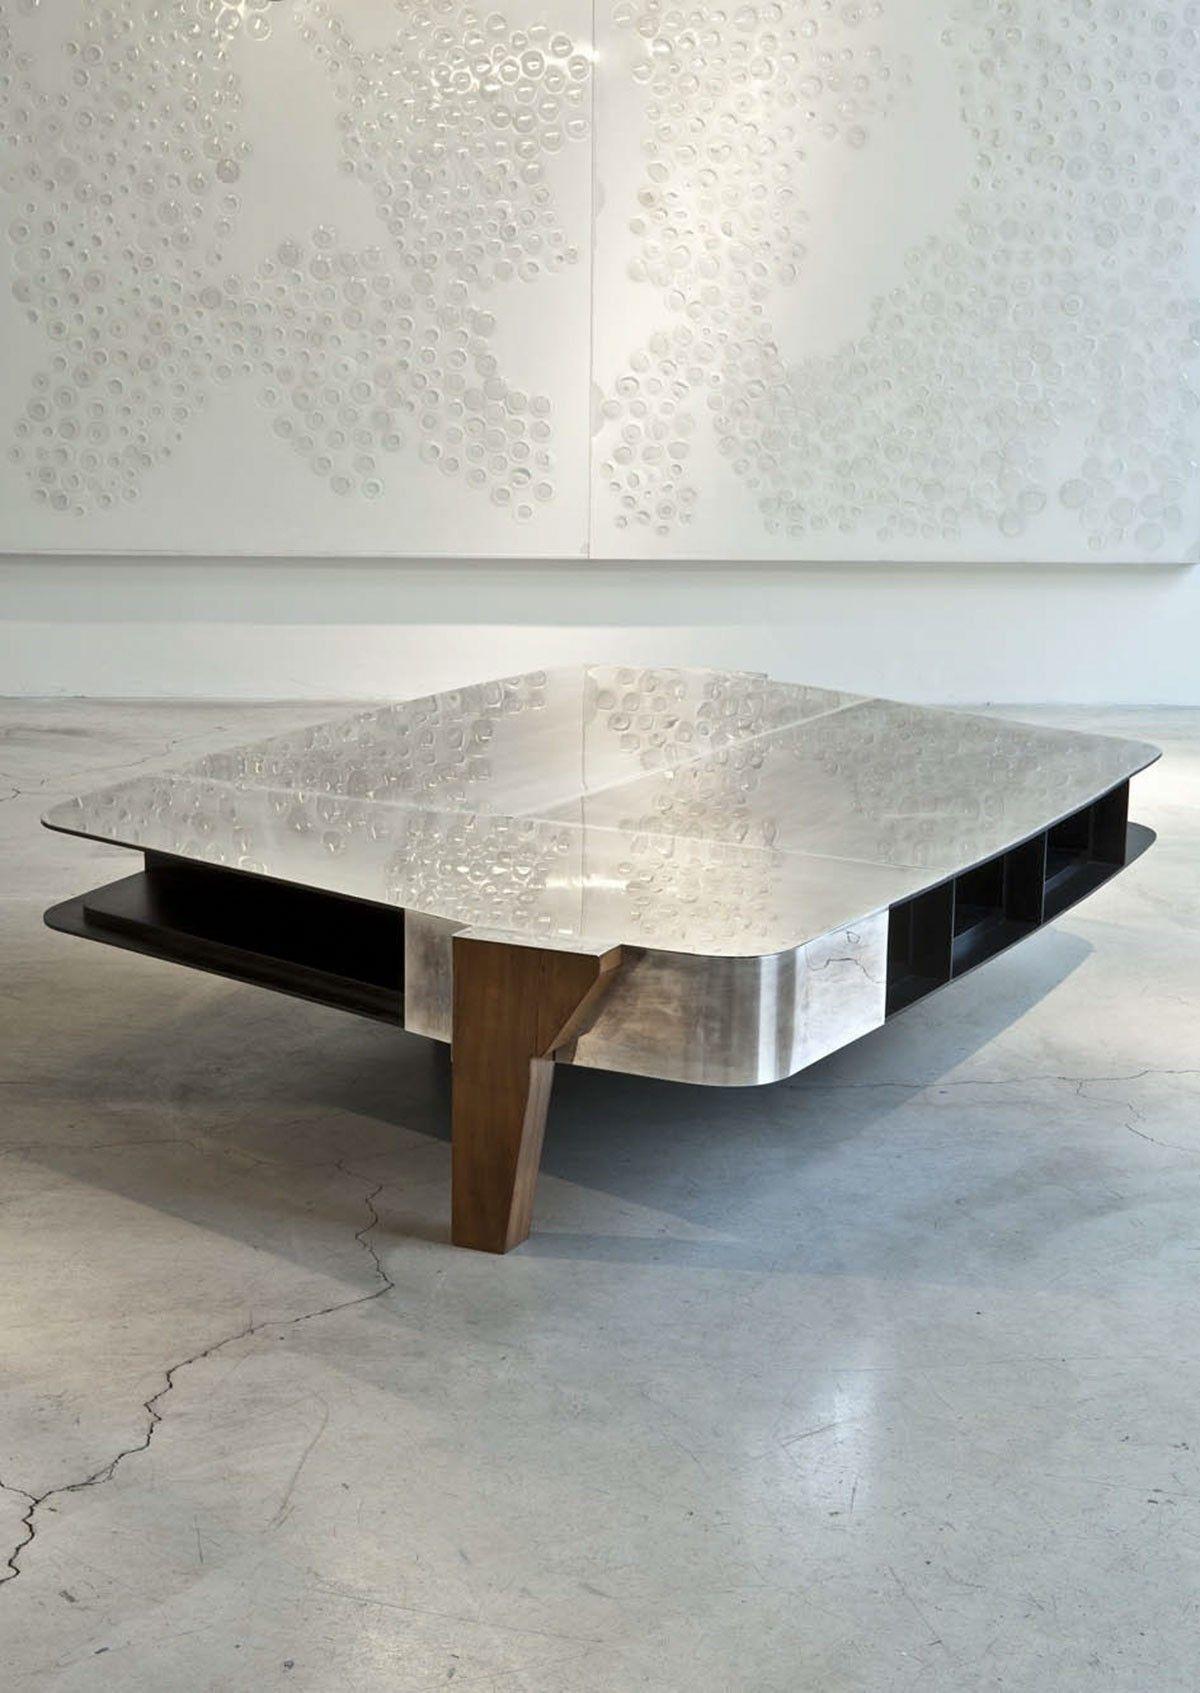 Dc1201 Coffee Table Coffee Table Design Coffee Table Design Modern [ 1693 x 1200 Pixel ]